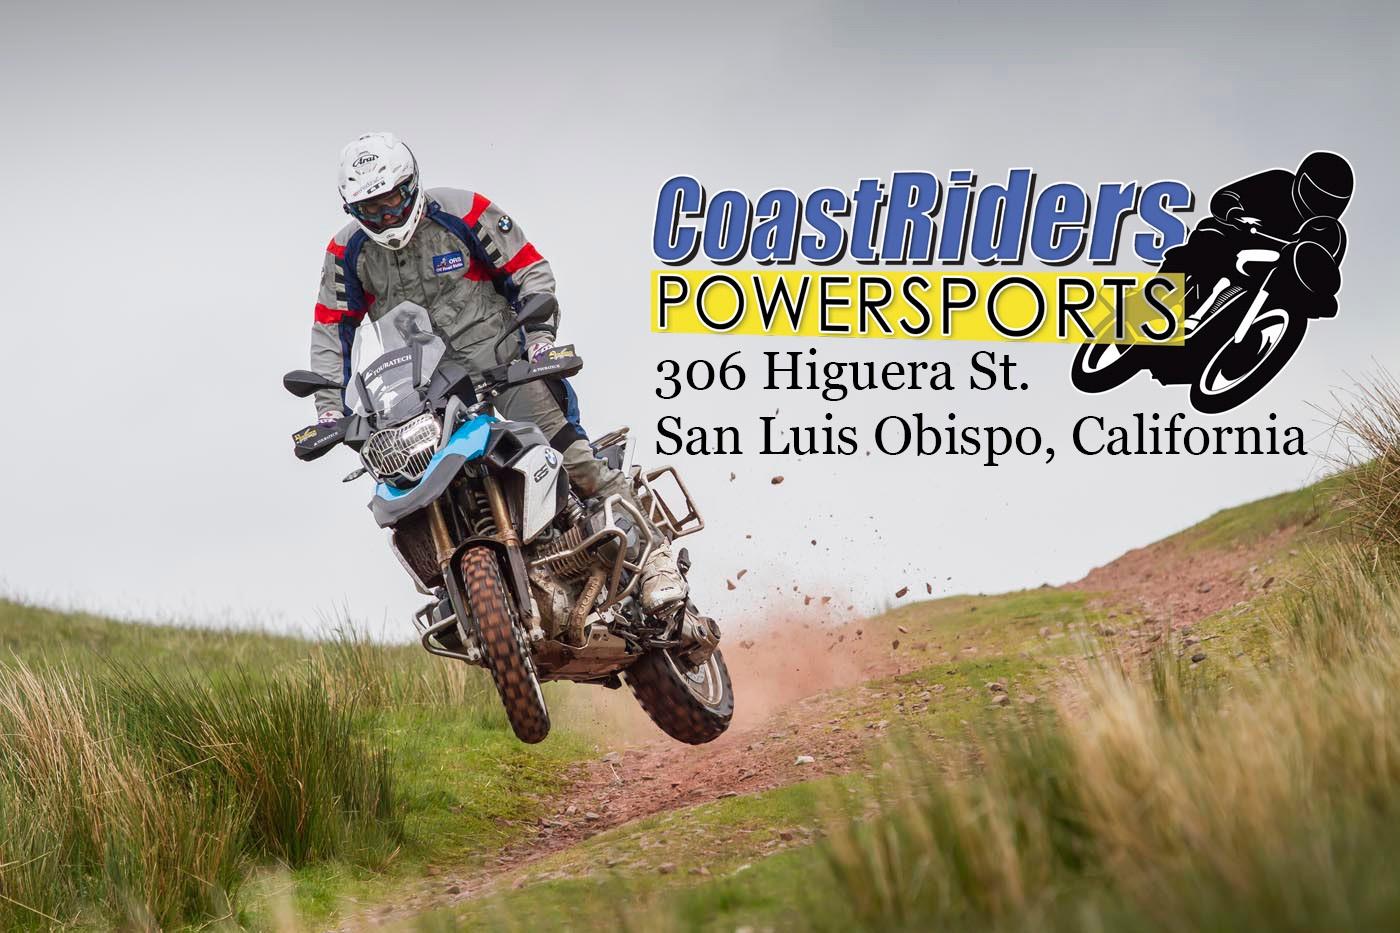 Coastriders Powersports logo